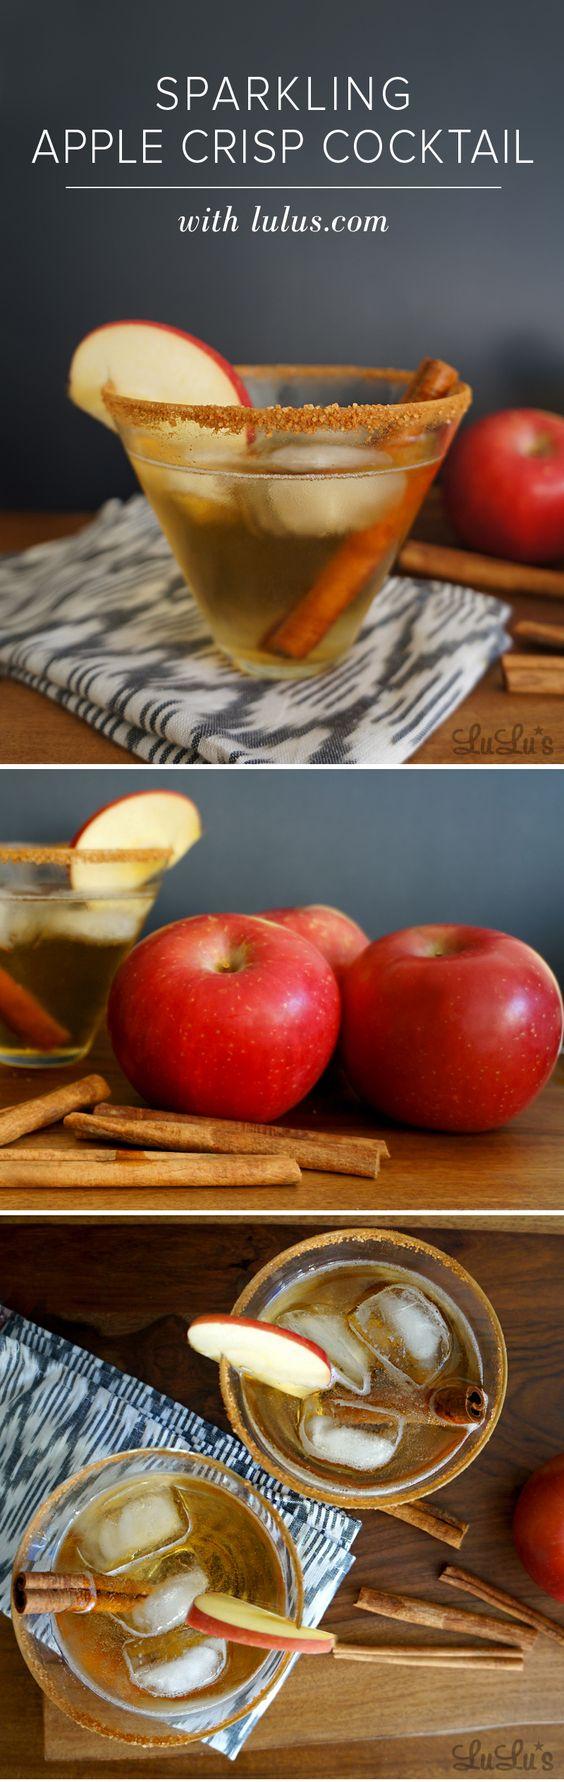 and more apple crisp cocktail ingredients cocktails apples apple ...